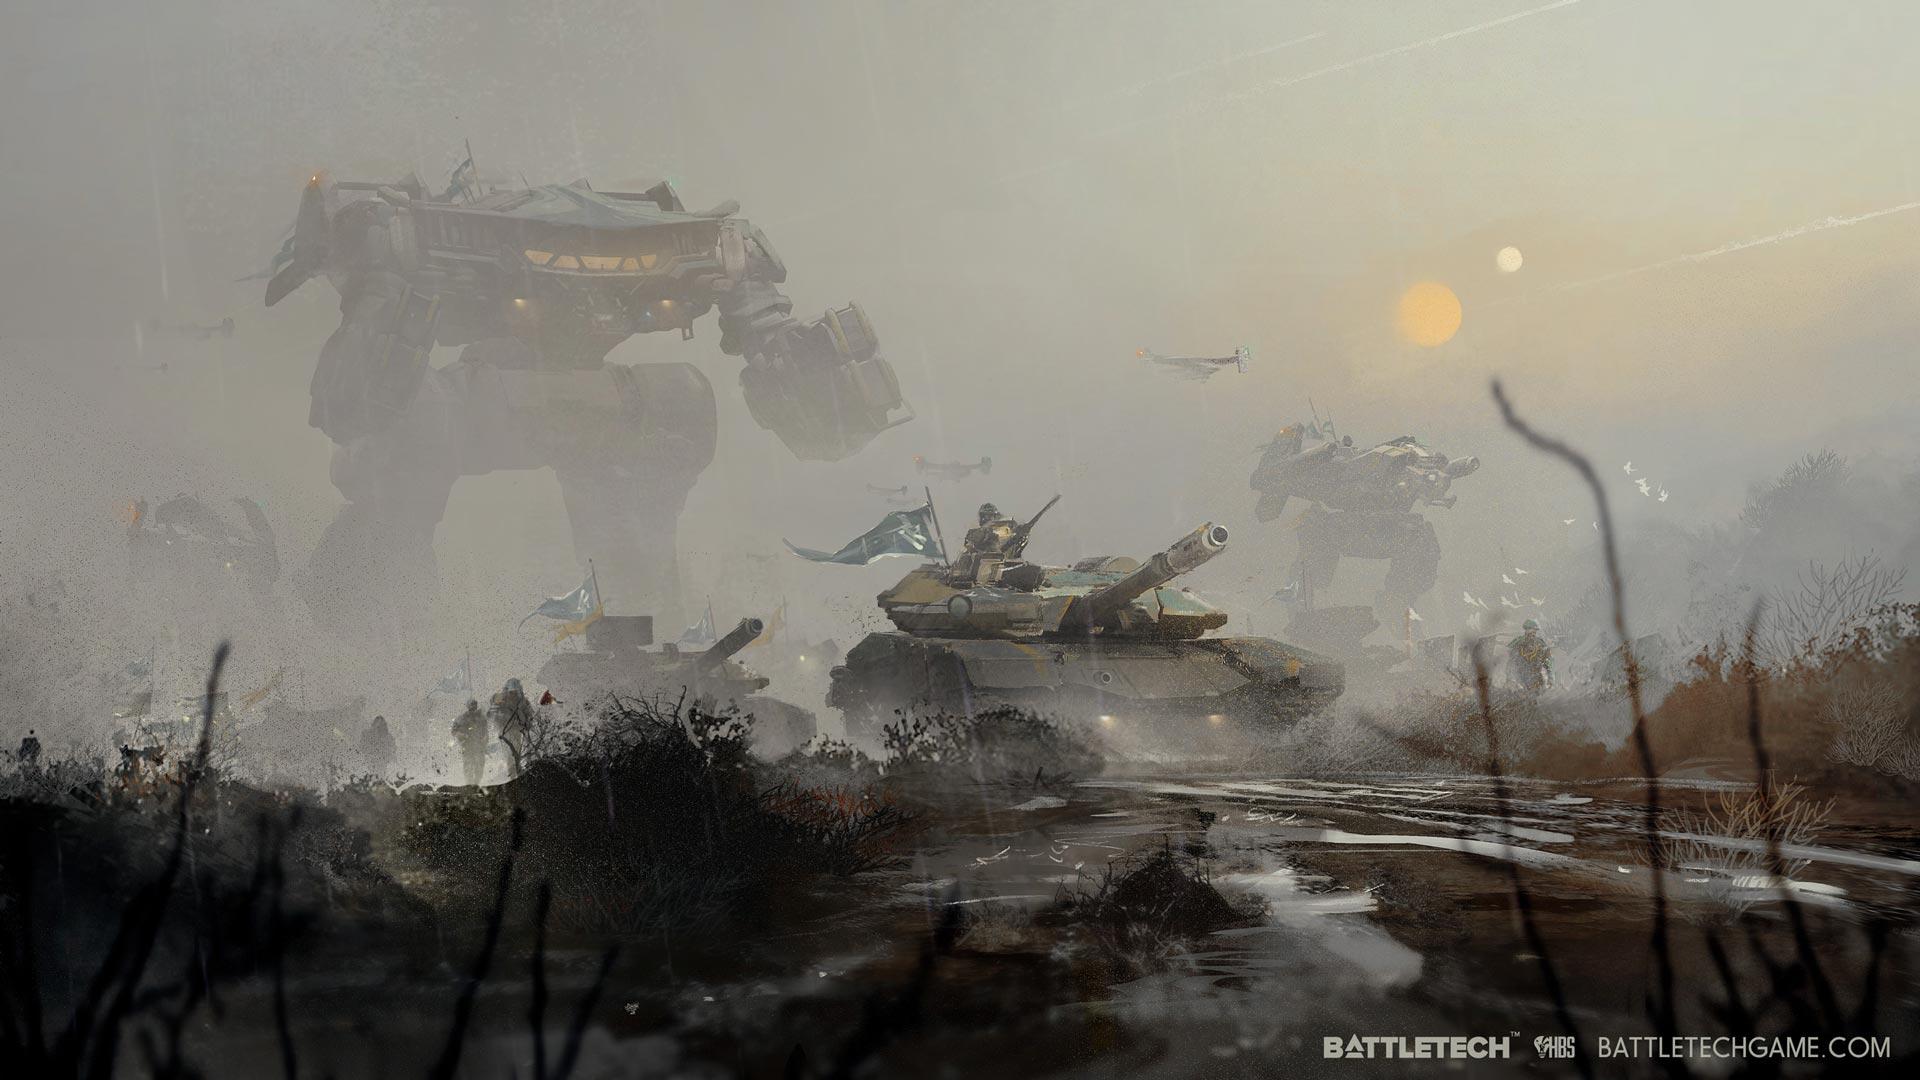 Mercenary tank accompanying BattleMechs